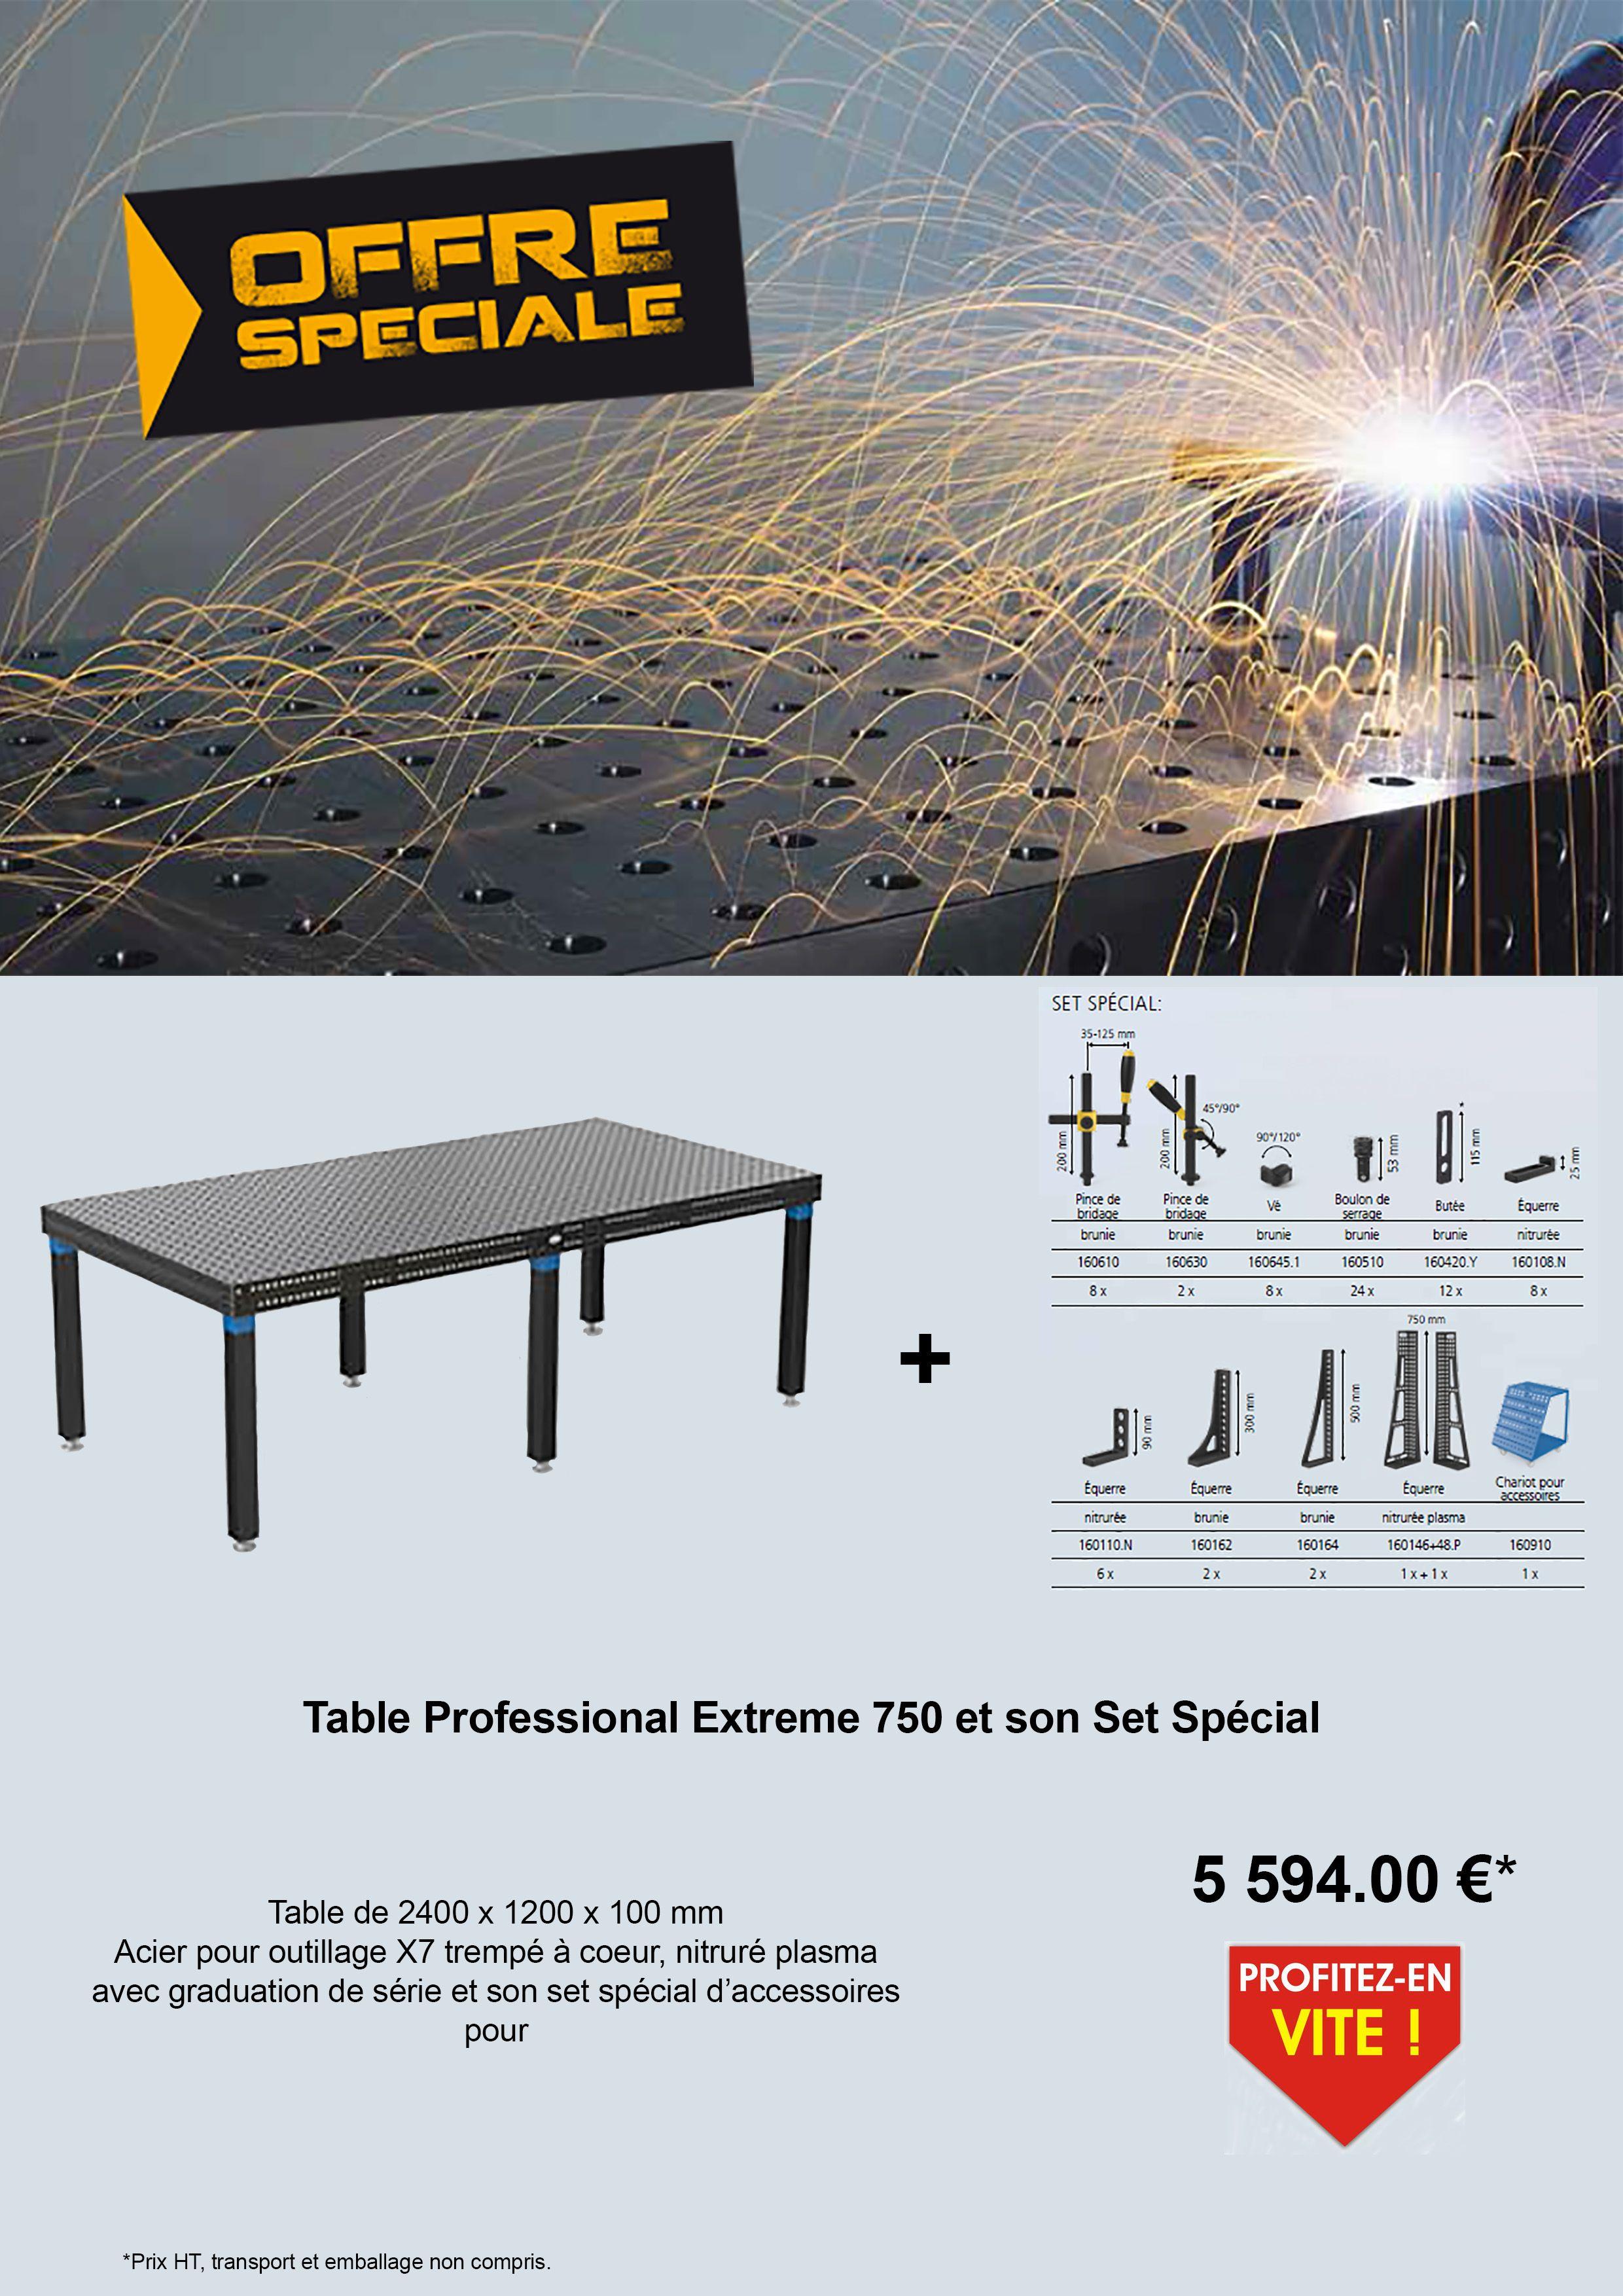 22fb5adee48d971b8d16b069aaaf54f9 Frais De Fabriquer Une Table Schème